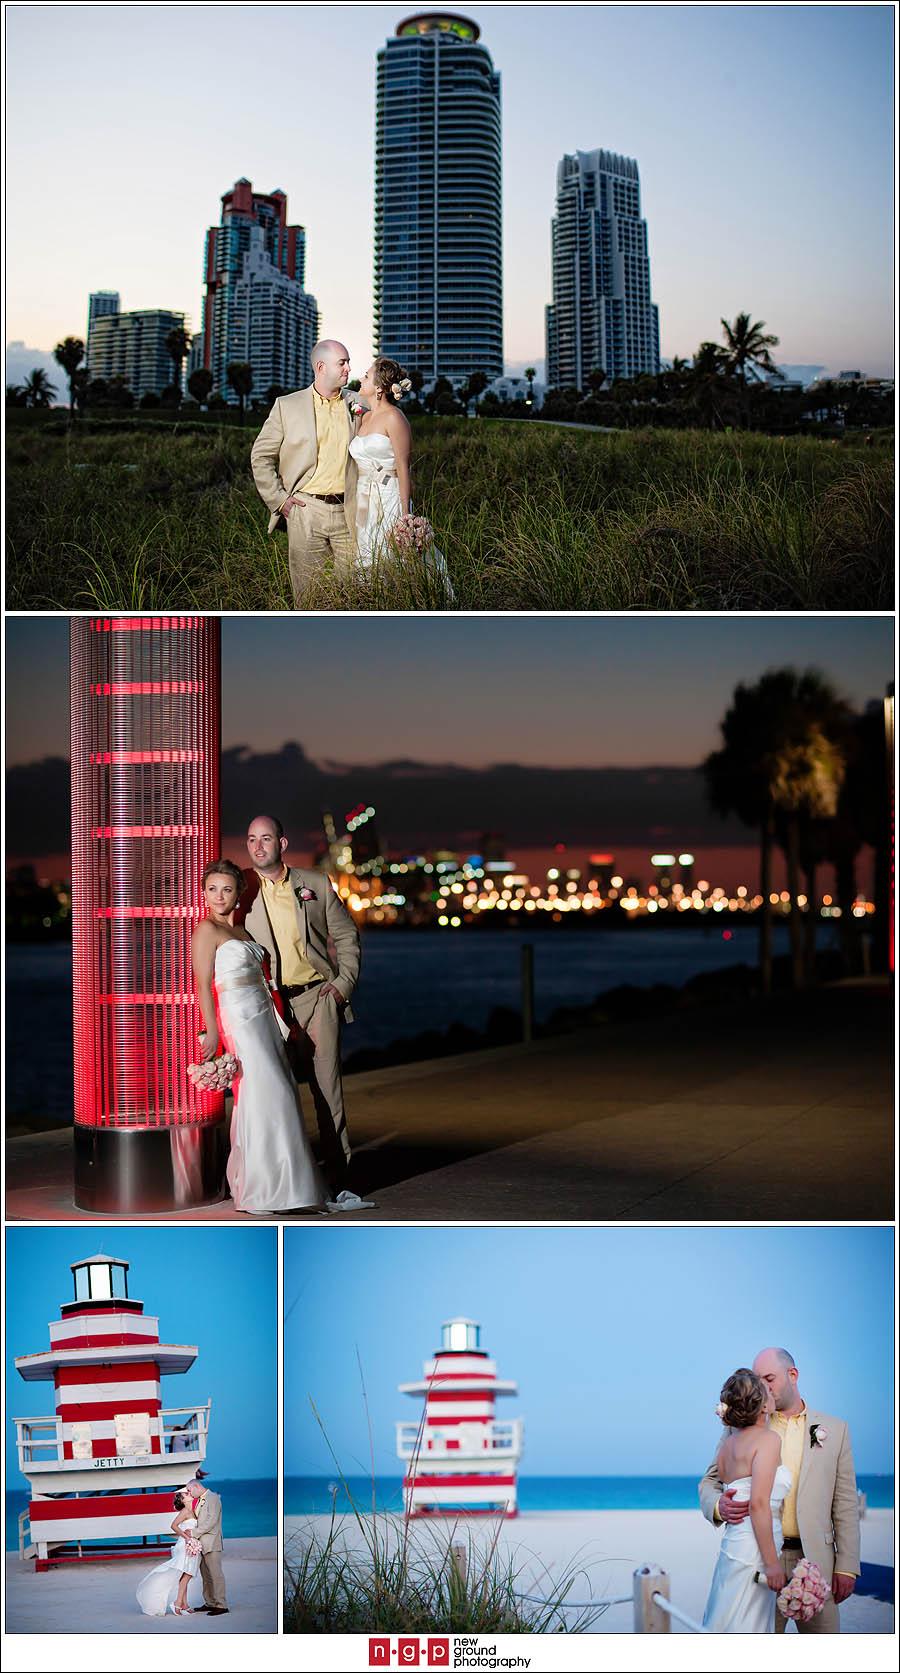 Wedding Photography Miami Beach: South Beach Miami Wedding